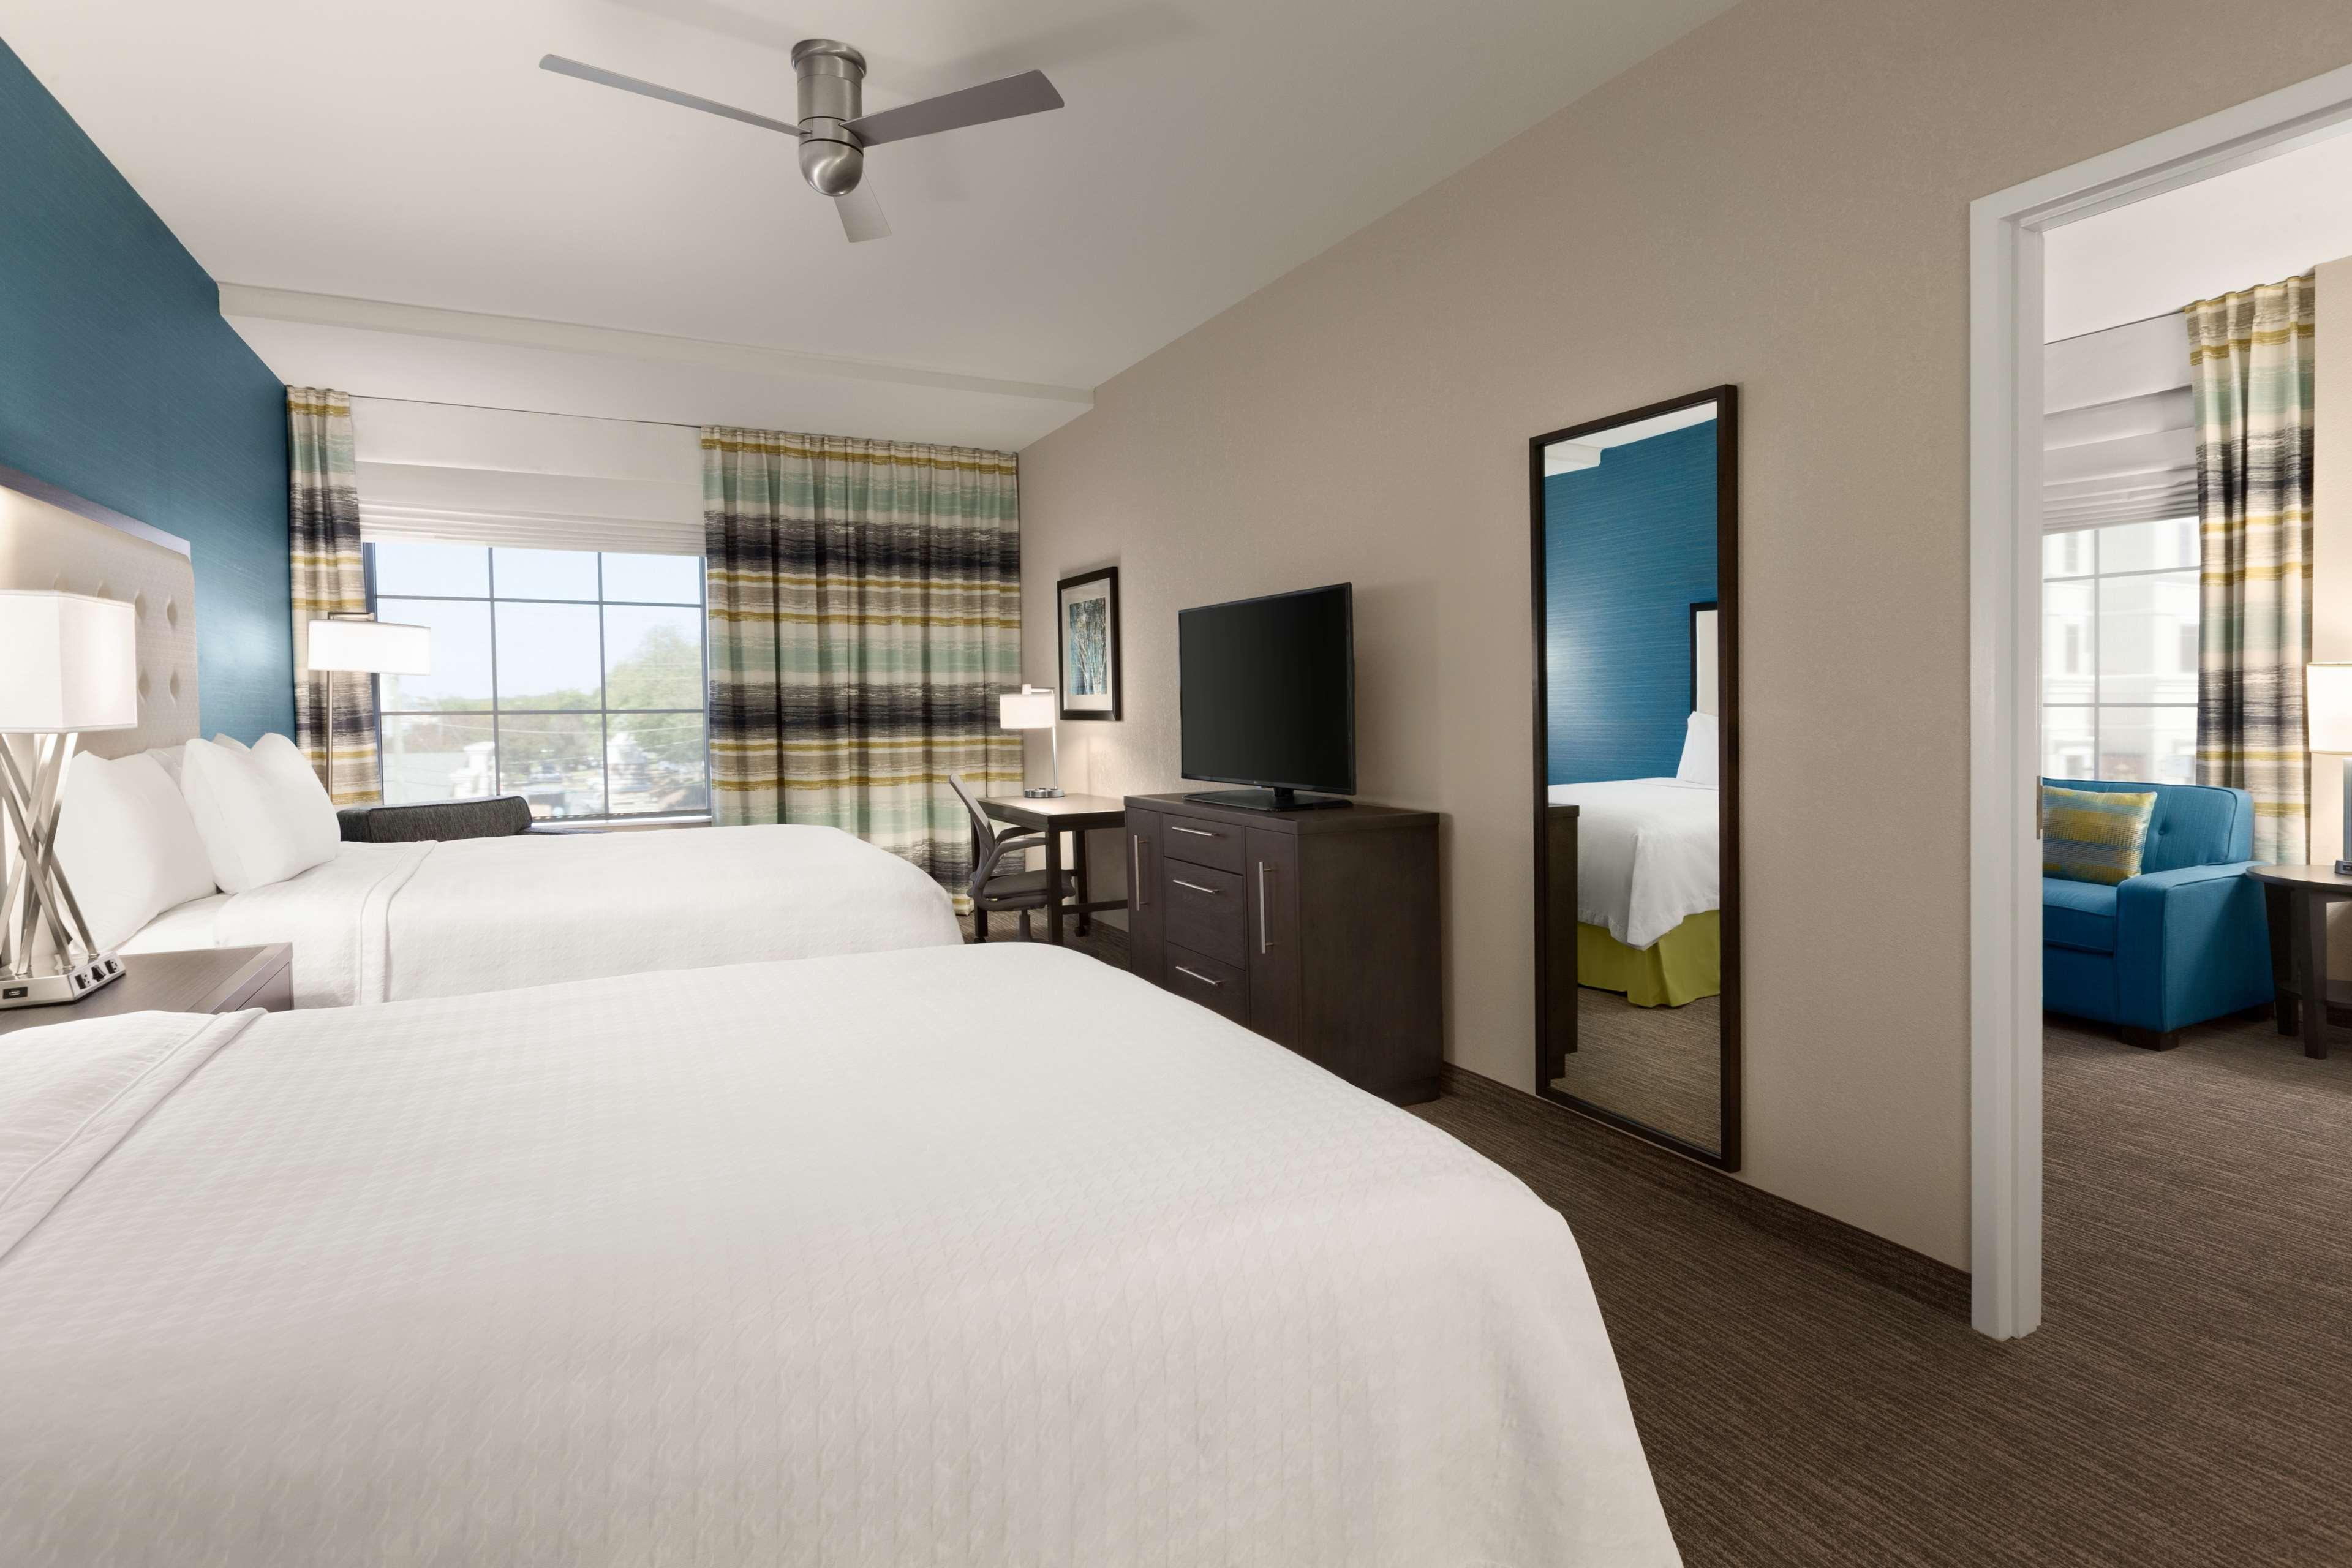 Homewood Suites by Hilton CharlotteSouthPark Charlotte North Carolina NC  LocalDatabasecom